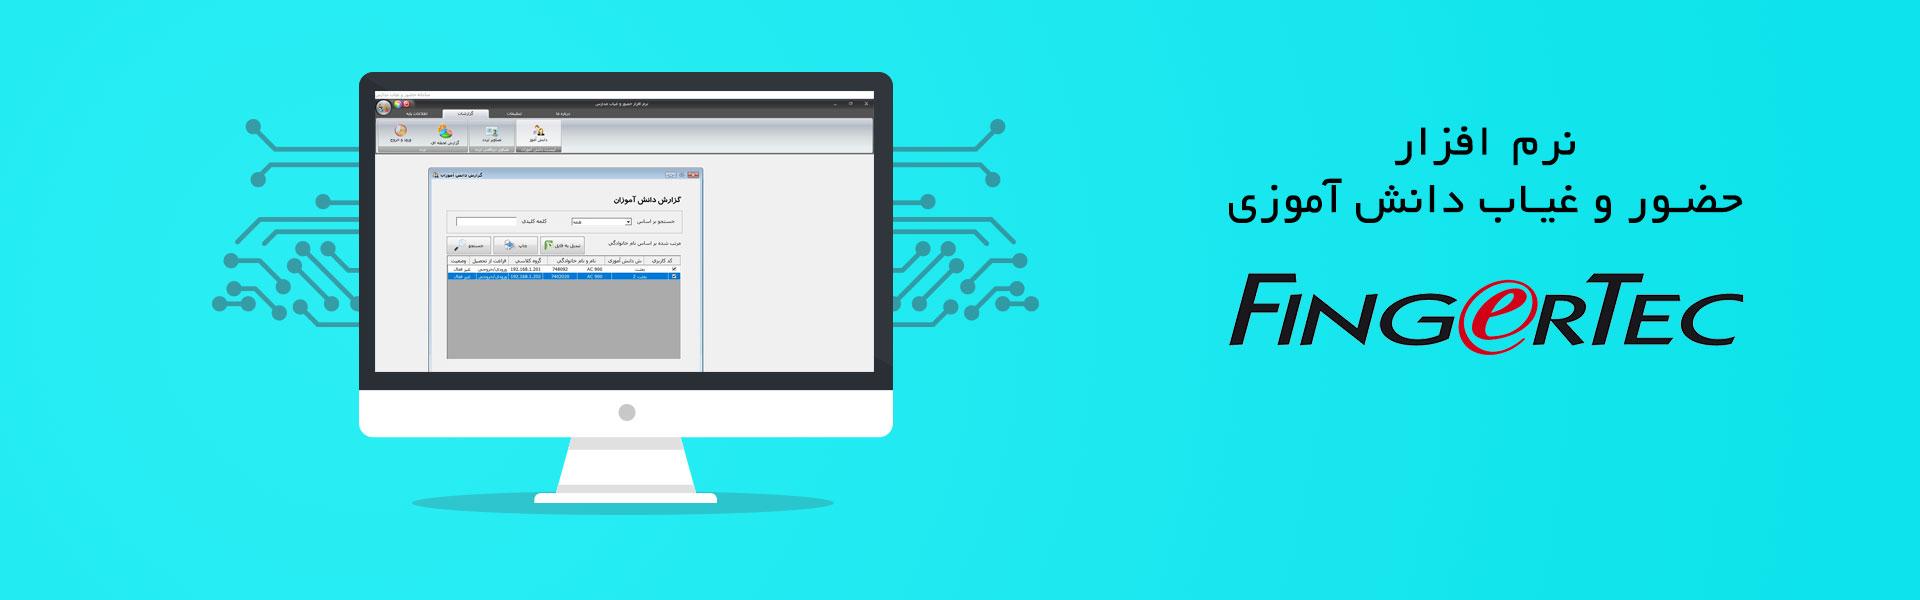 Student_Software.jpg